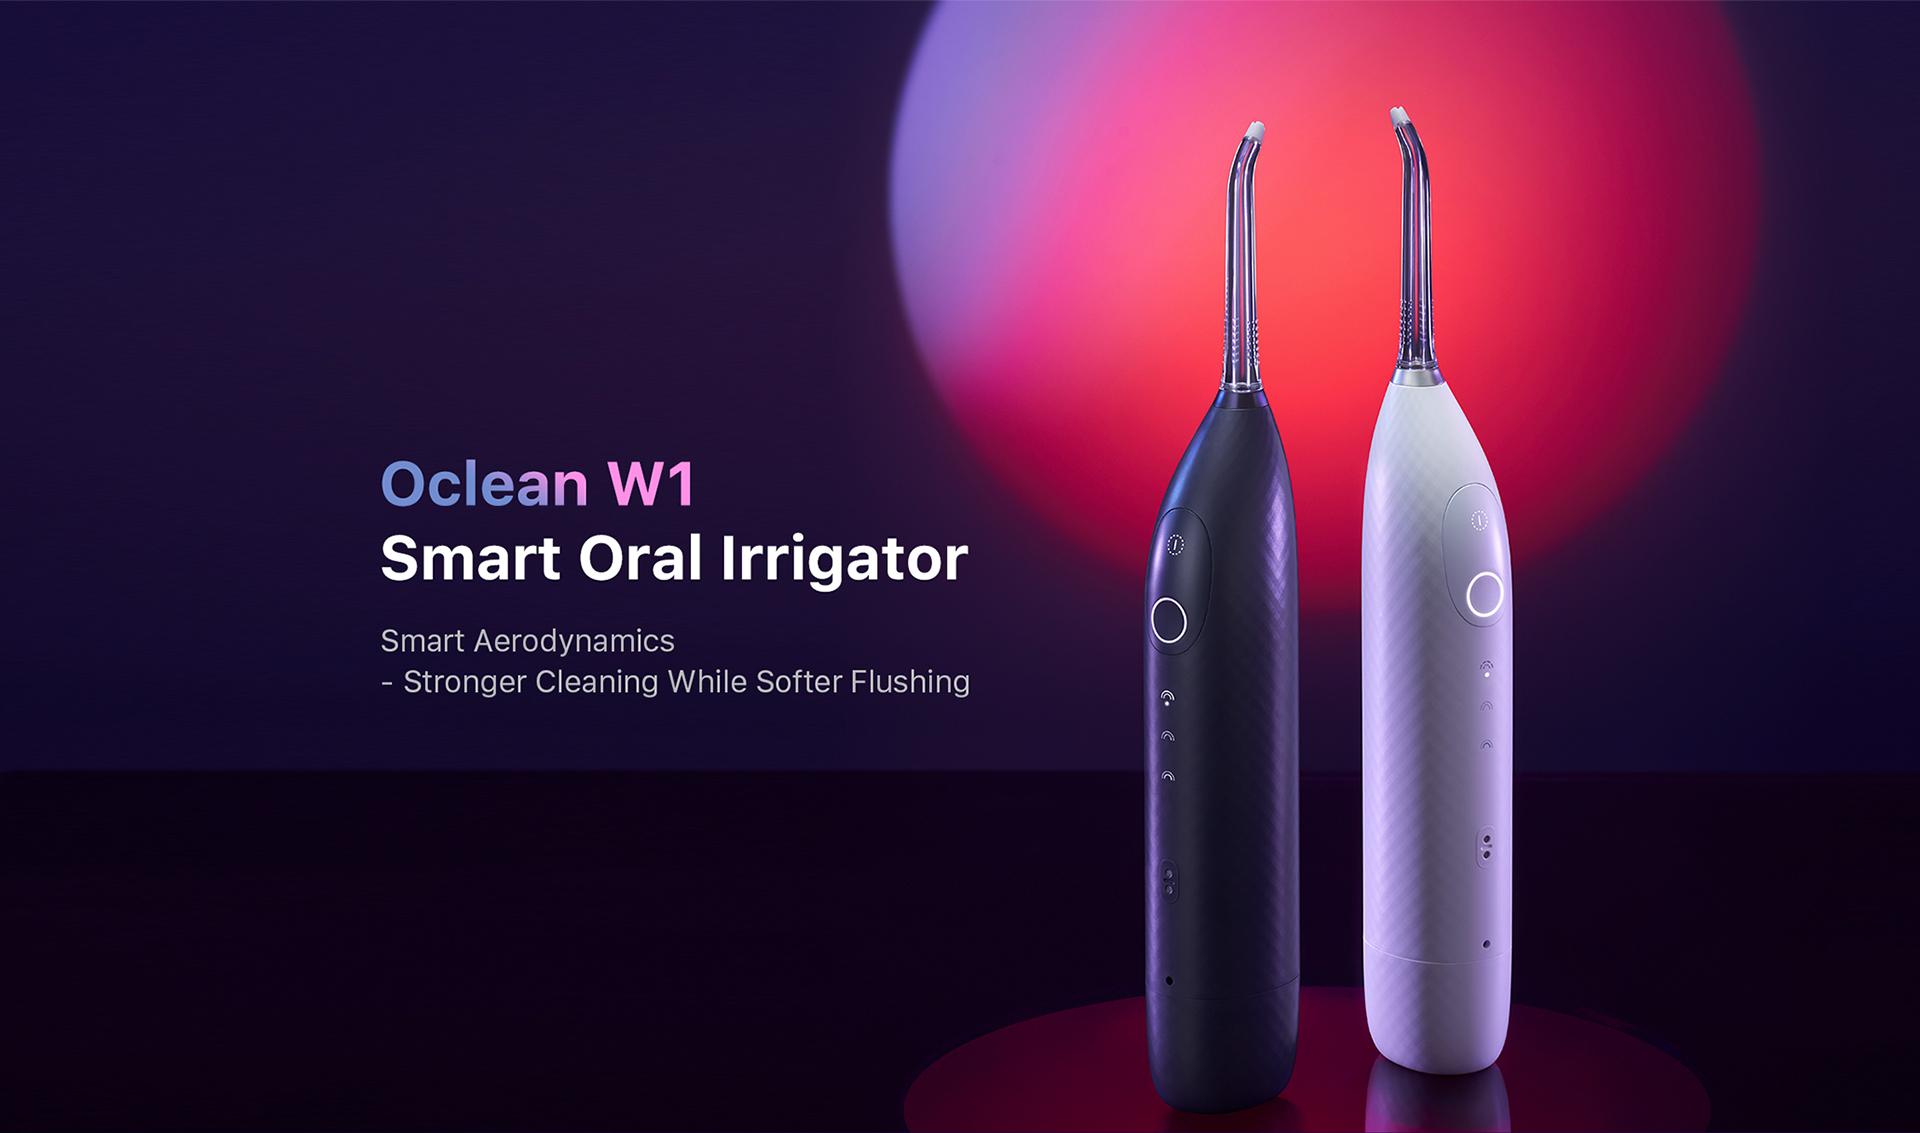 oclean W1 smart oral Irrigator